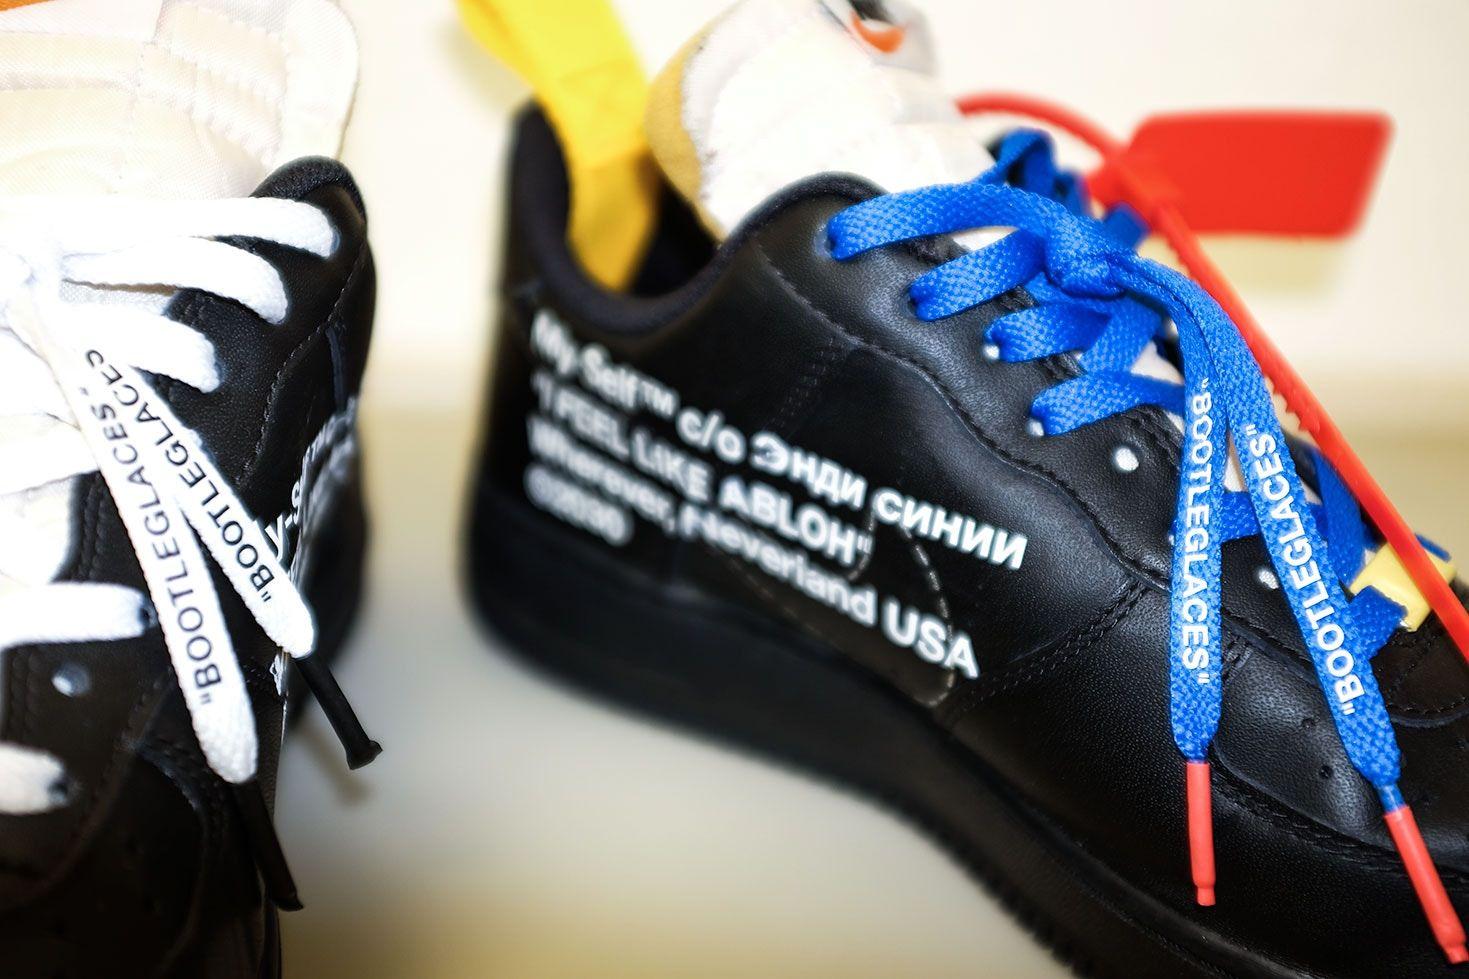 fd13cda3930a09 Virgil Abloh s Off-White x Nike Air Force 1 Inspires Custom ...